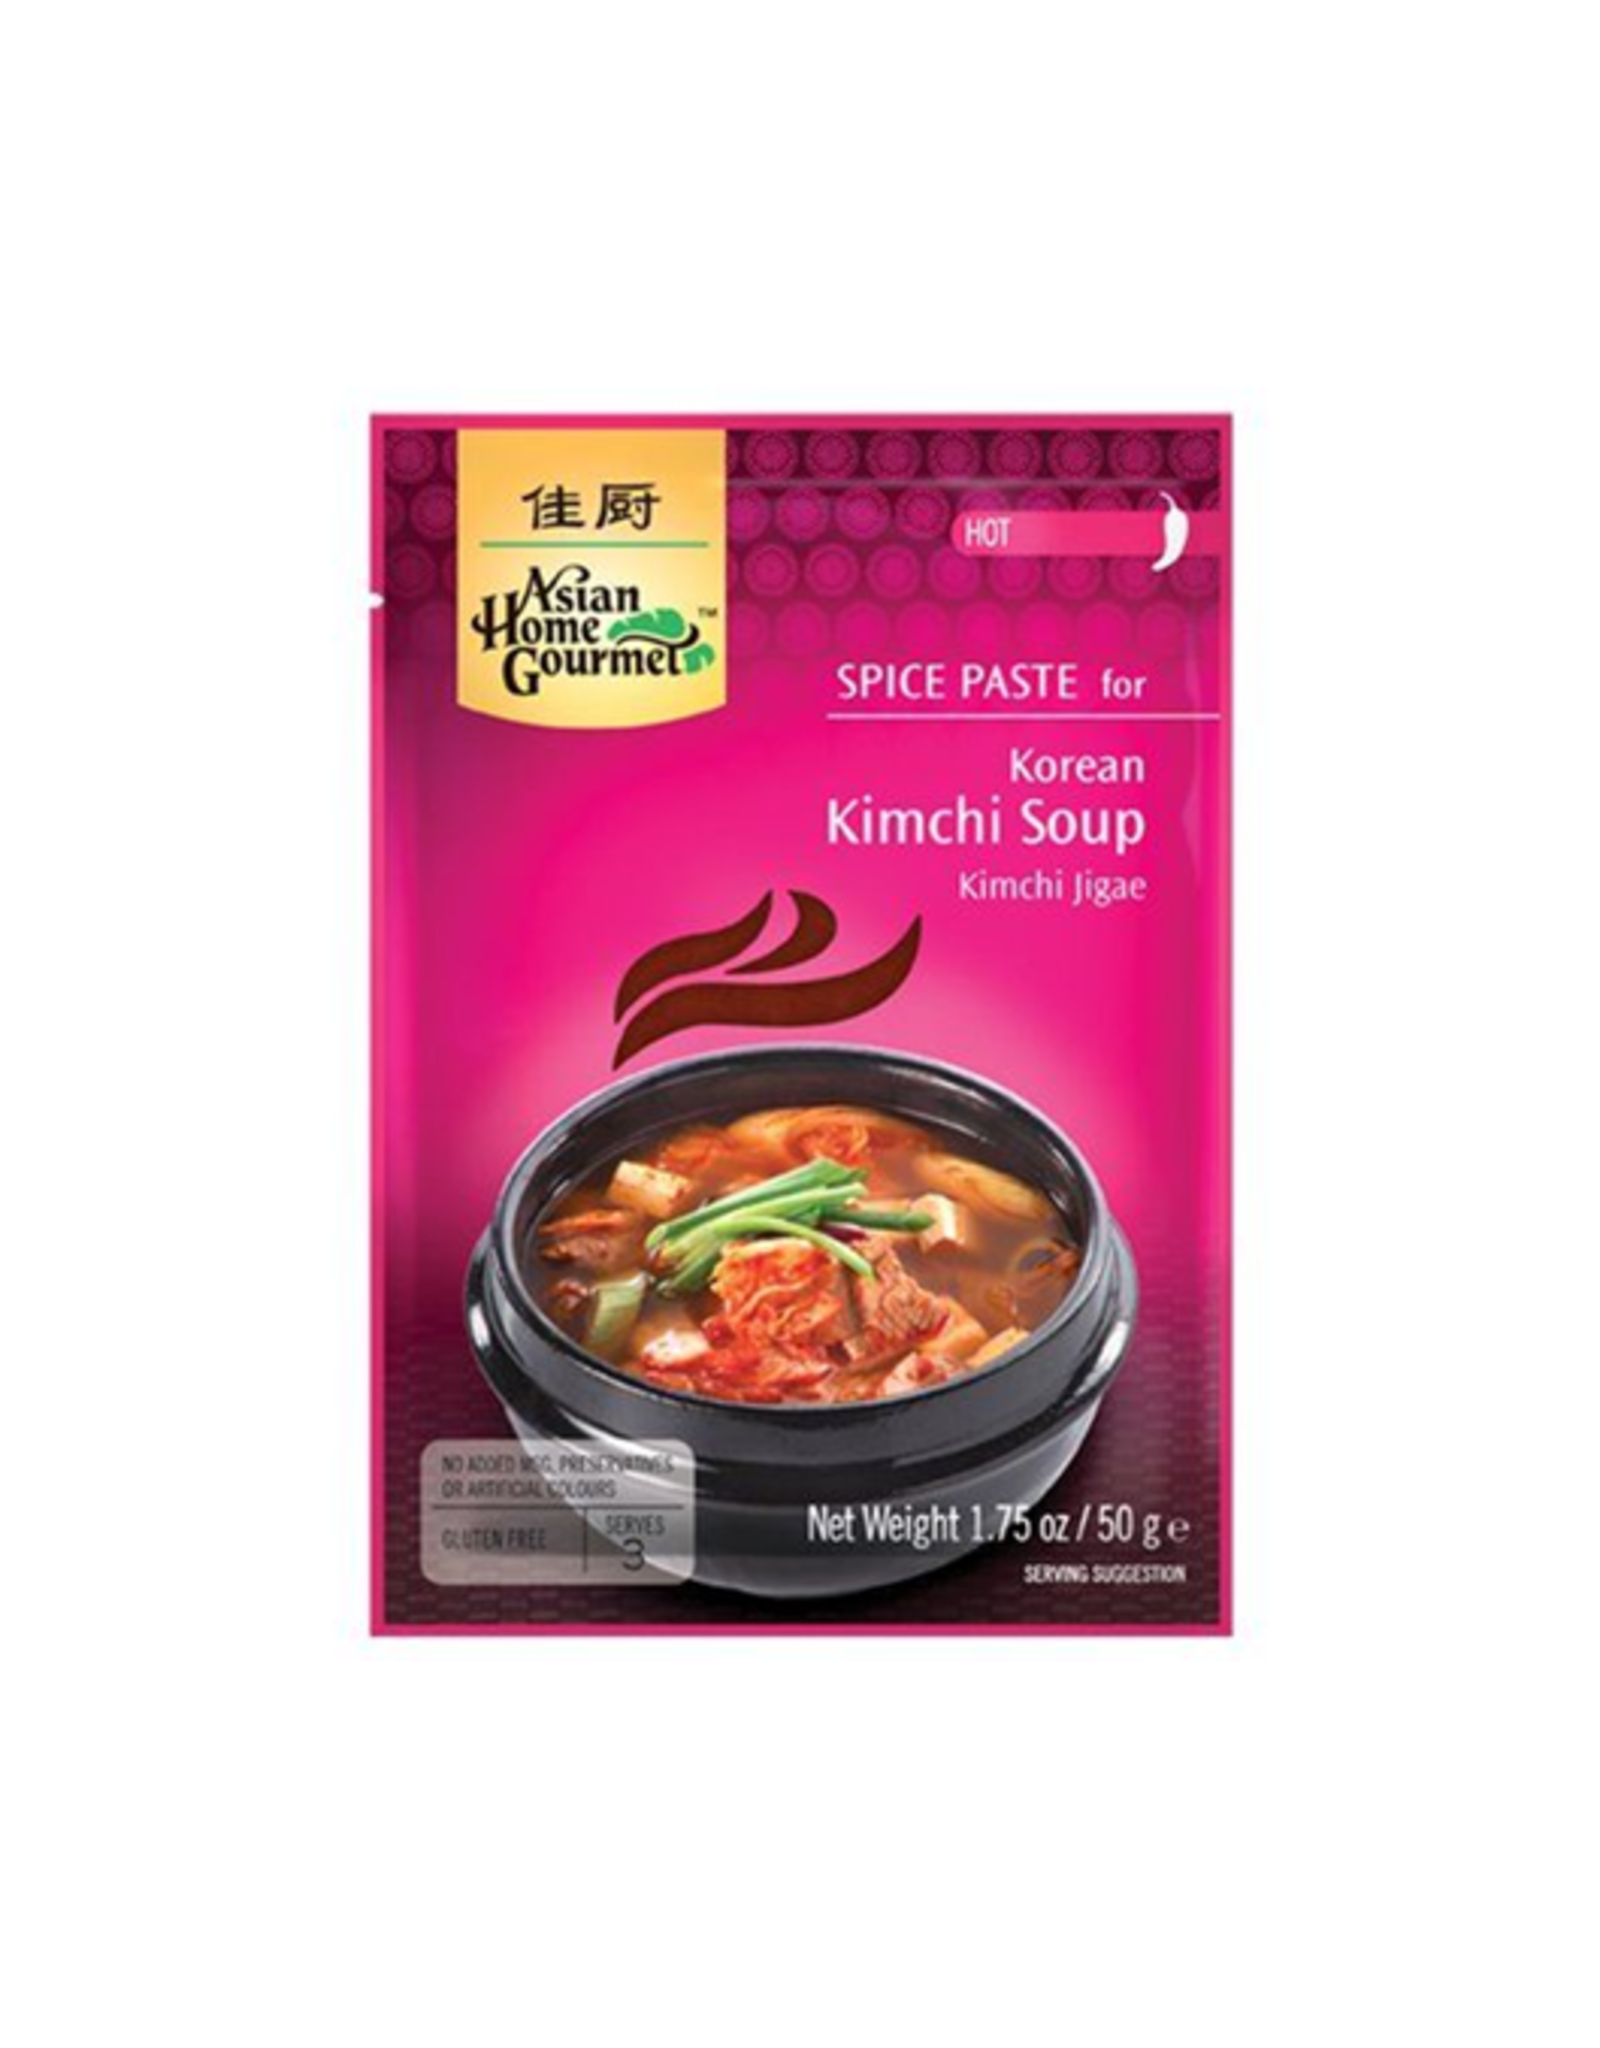 Asian Home Gourmet Koreaanse Kimchi Soup